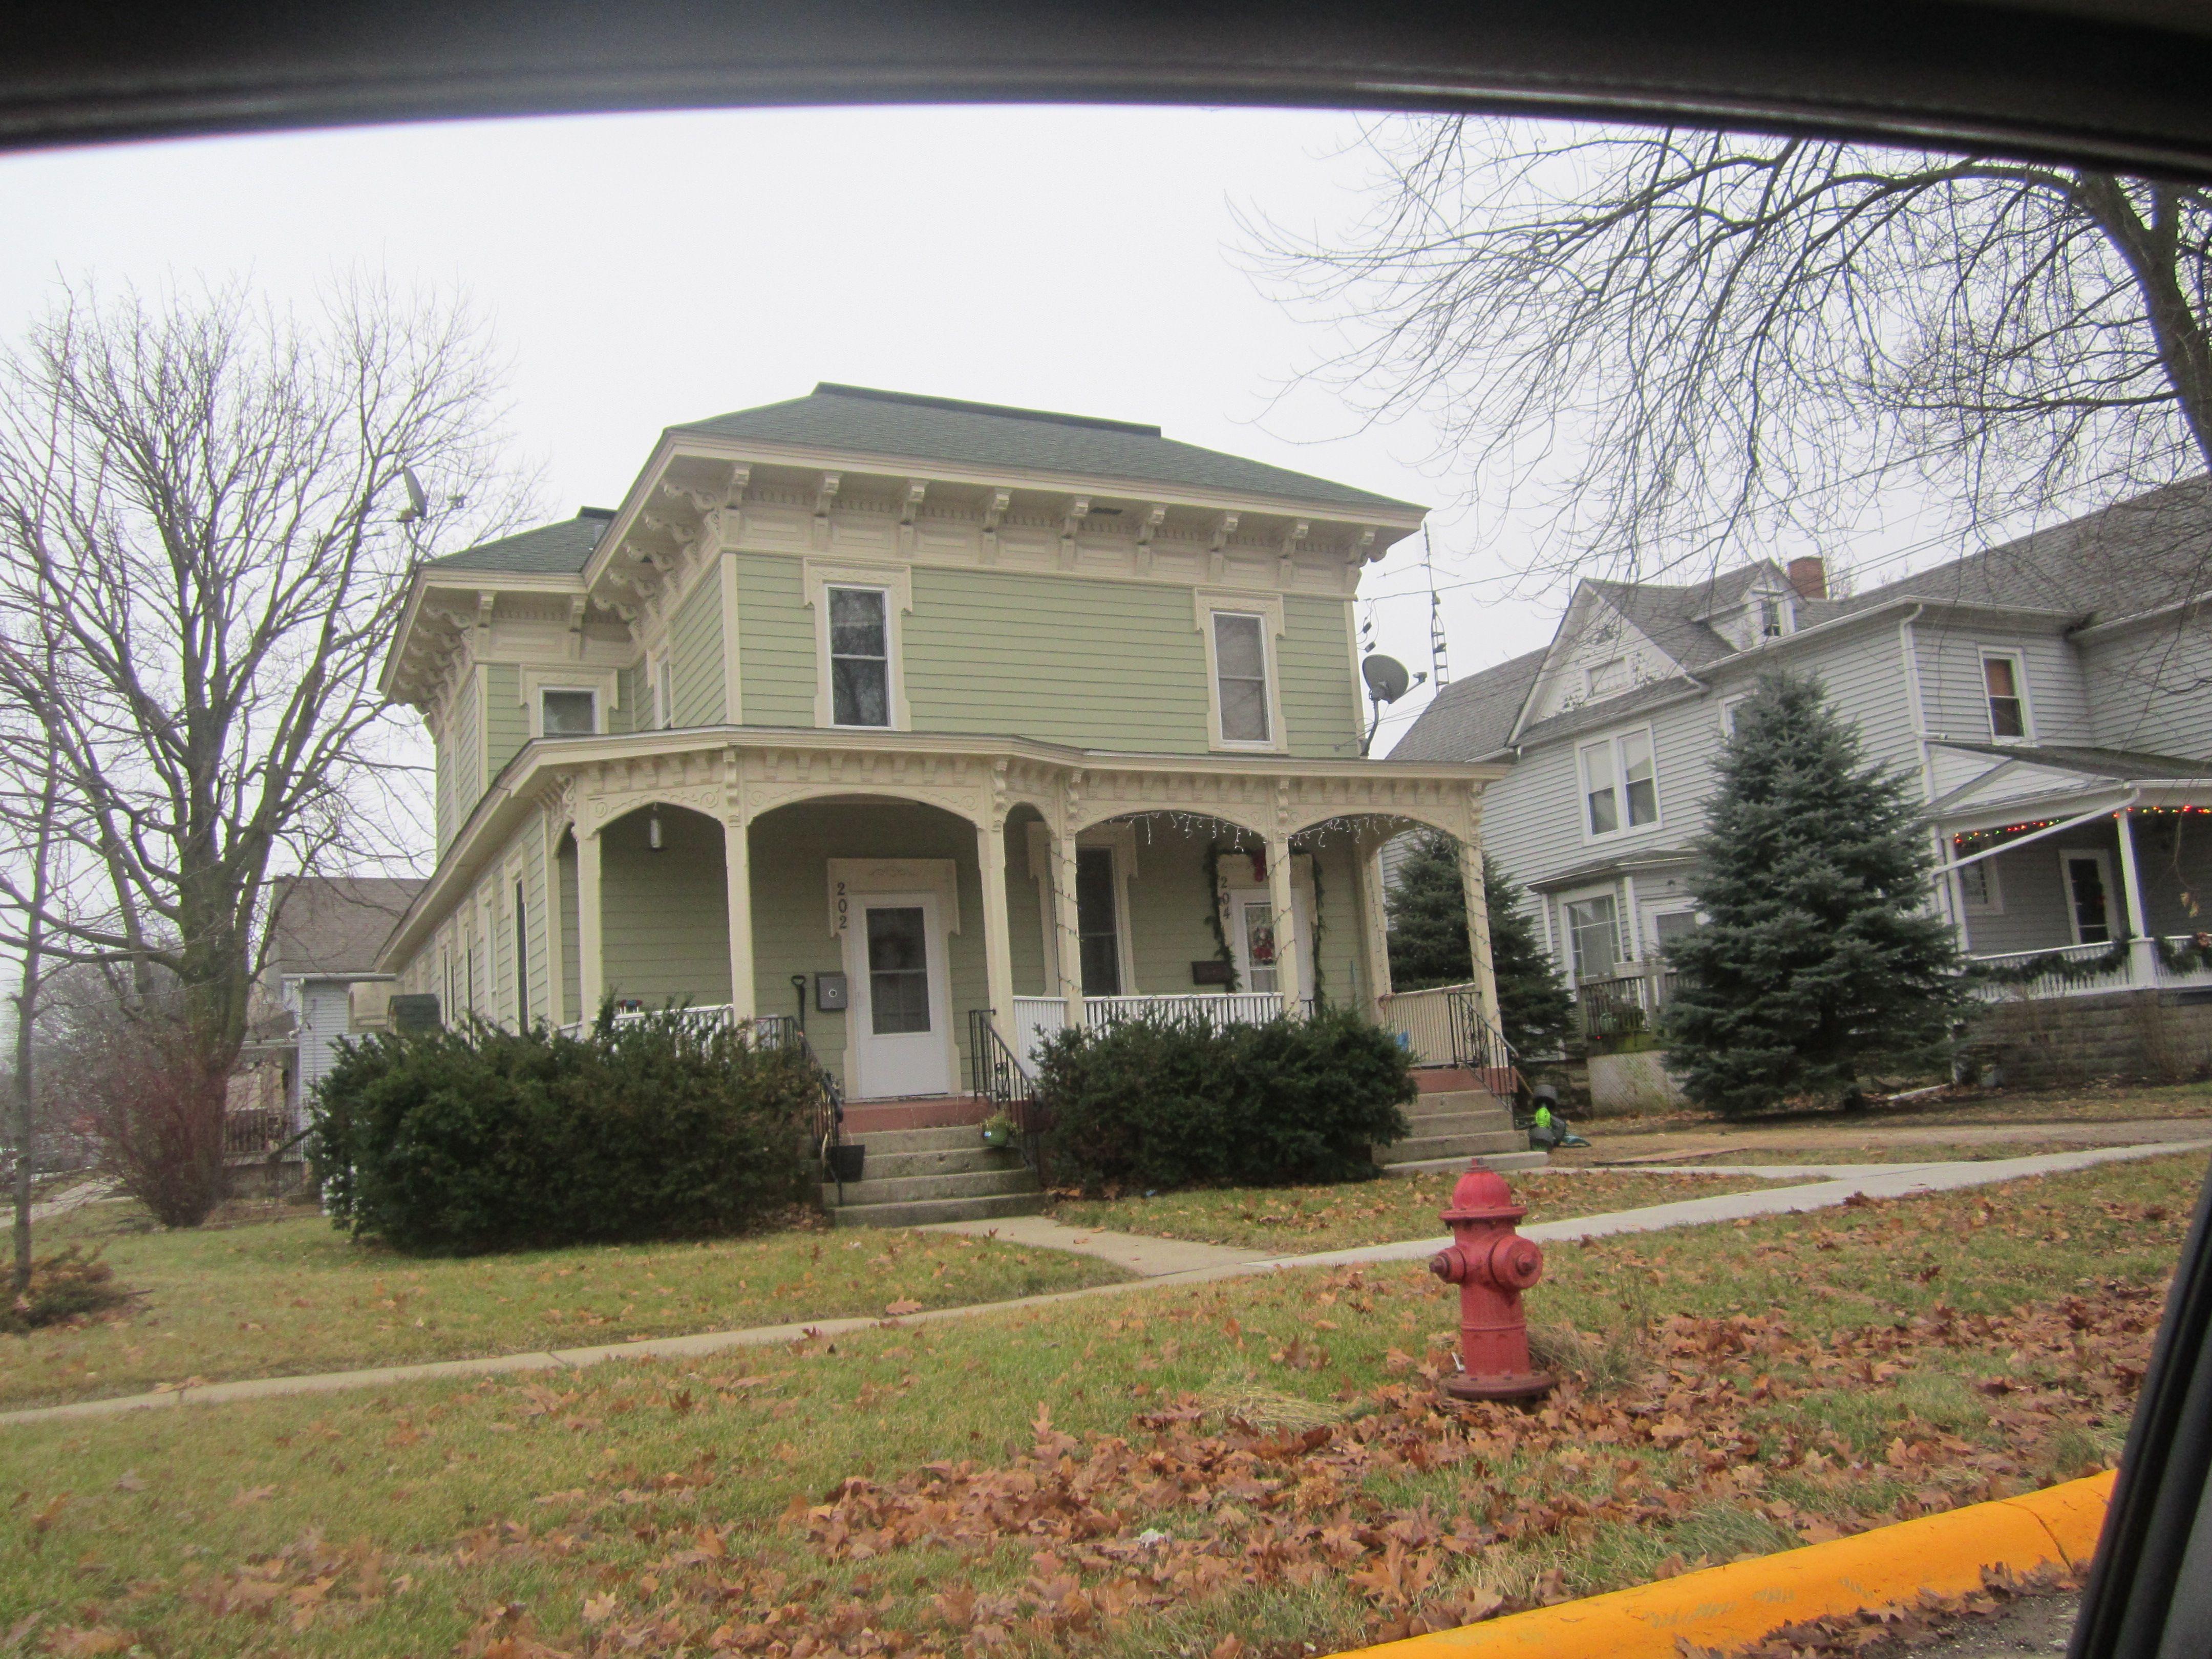 Common Sycamore house style- Italianate